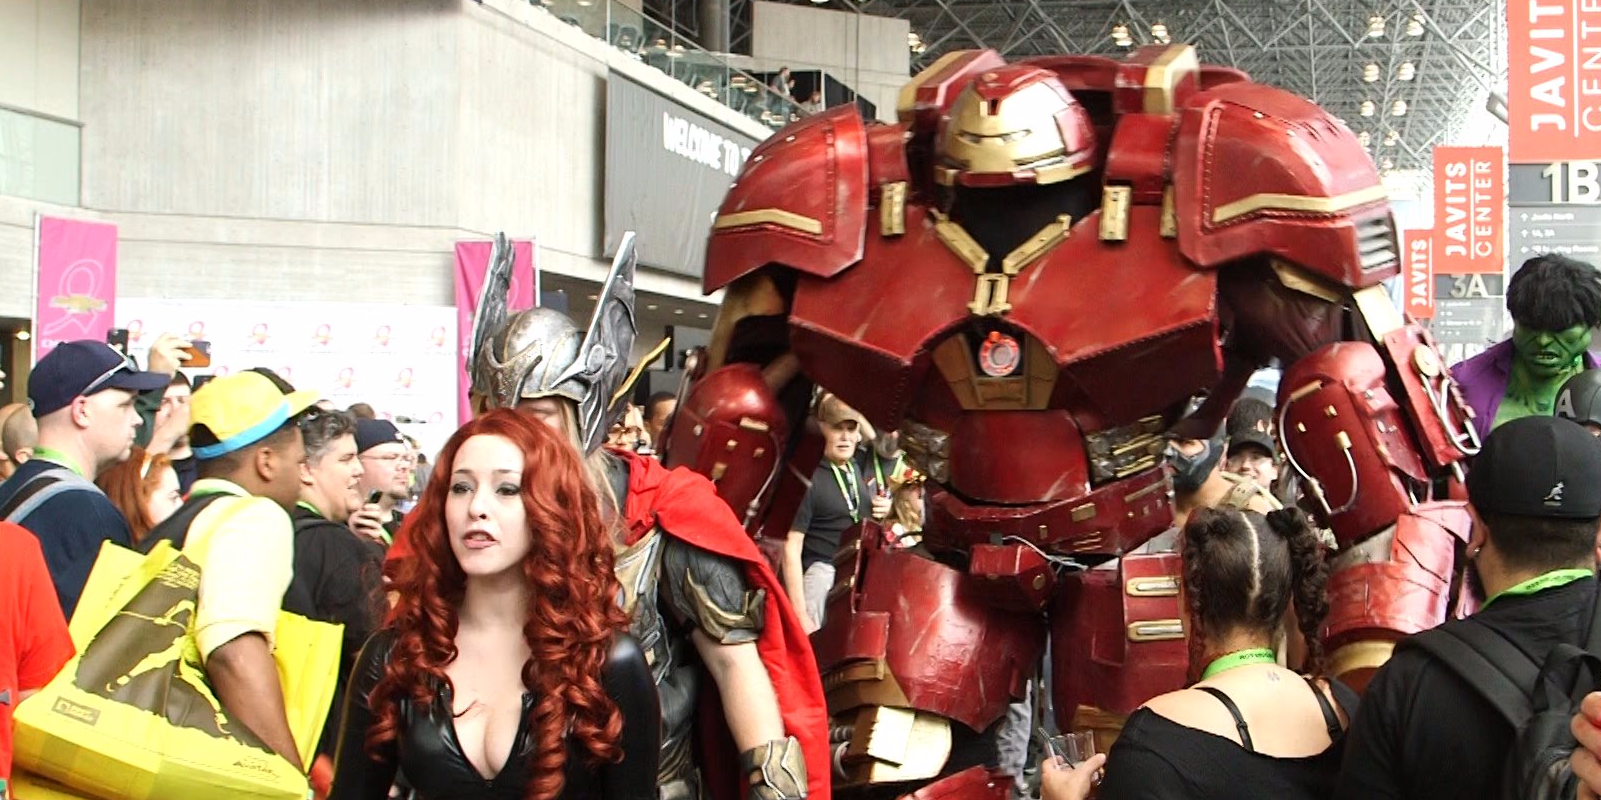 Obrovský Hulkbuster kostým vyhral New York Comic Con